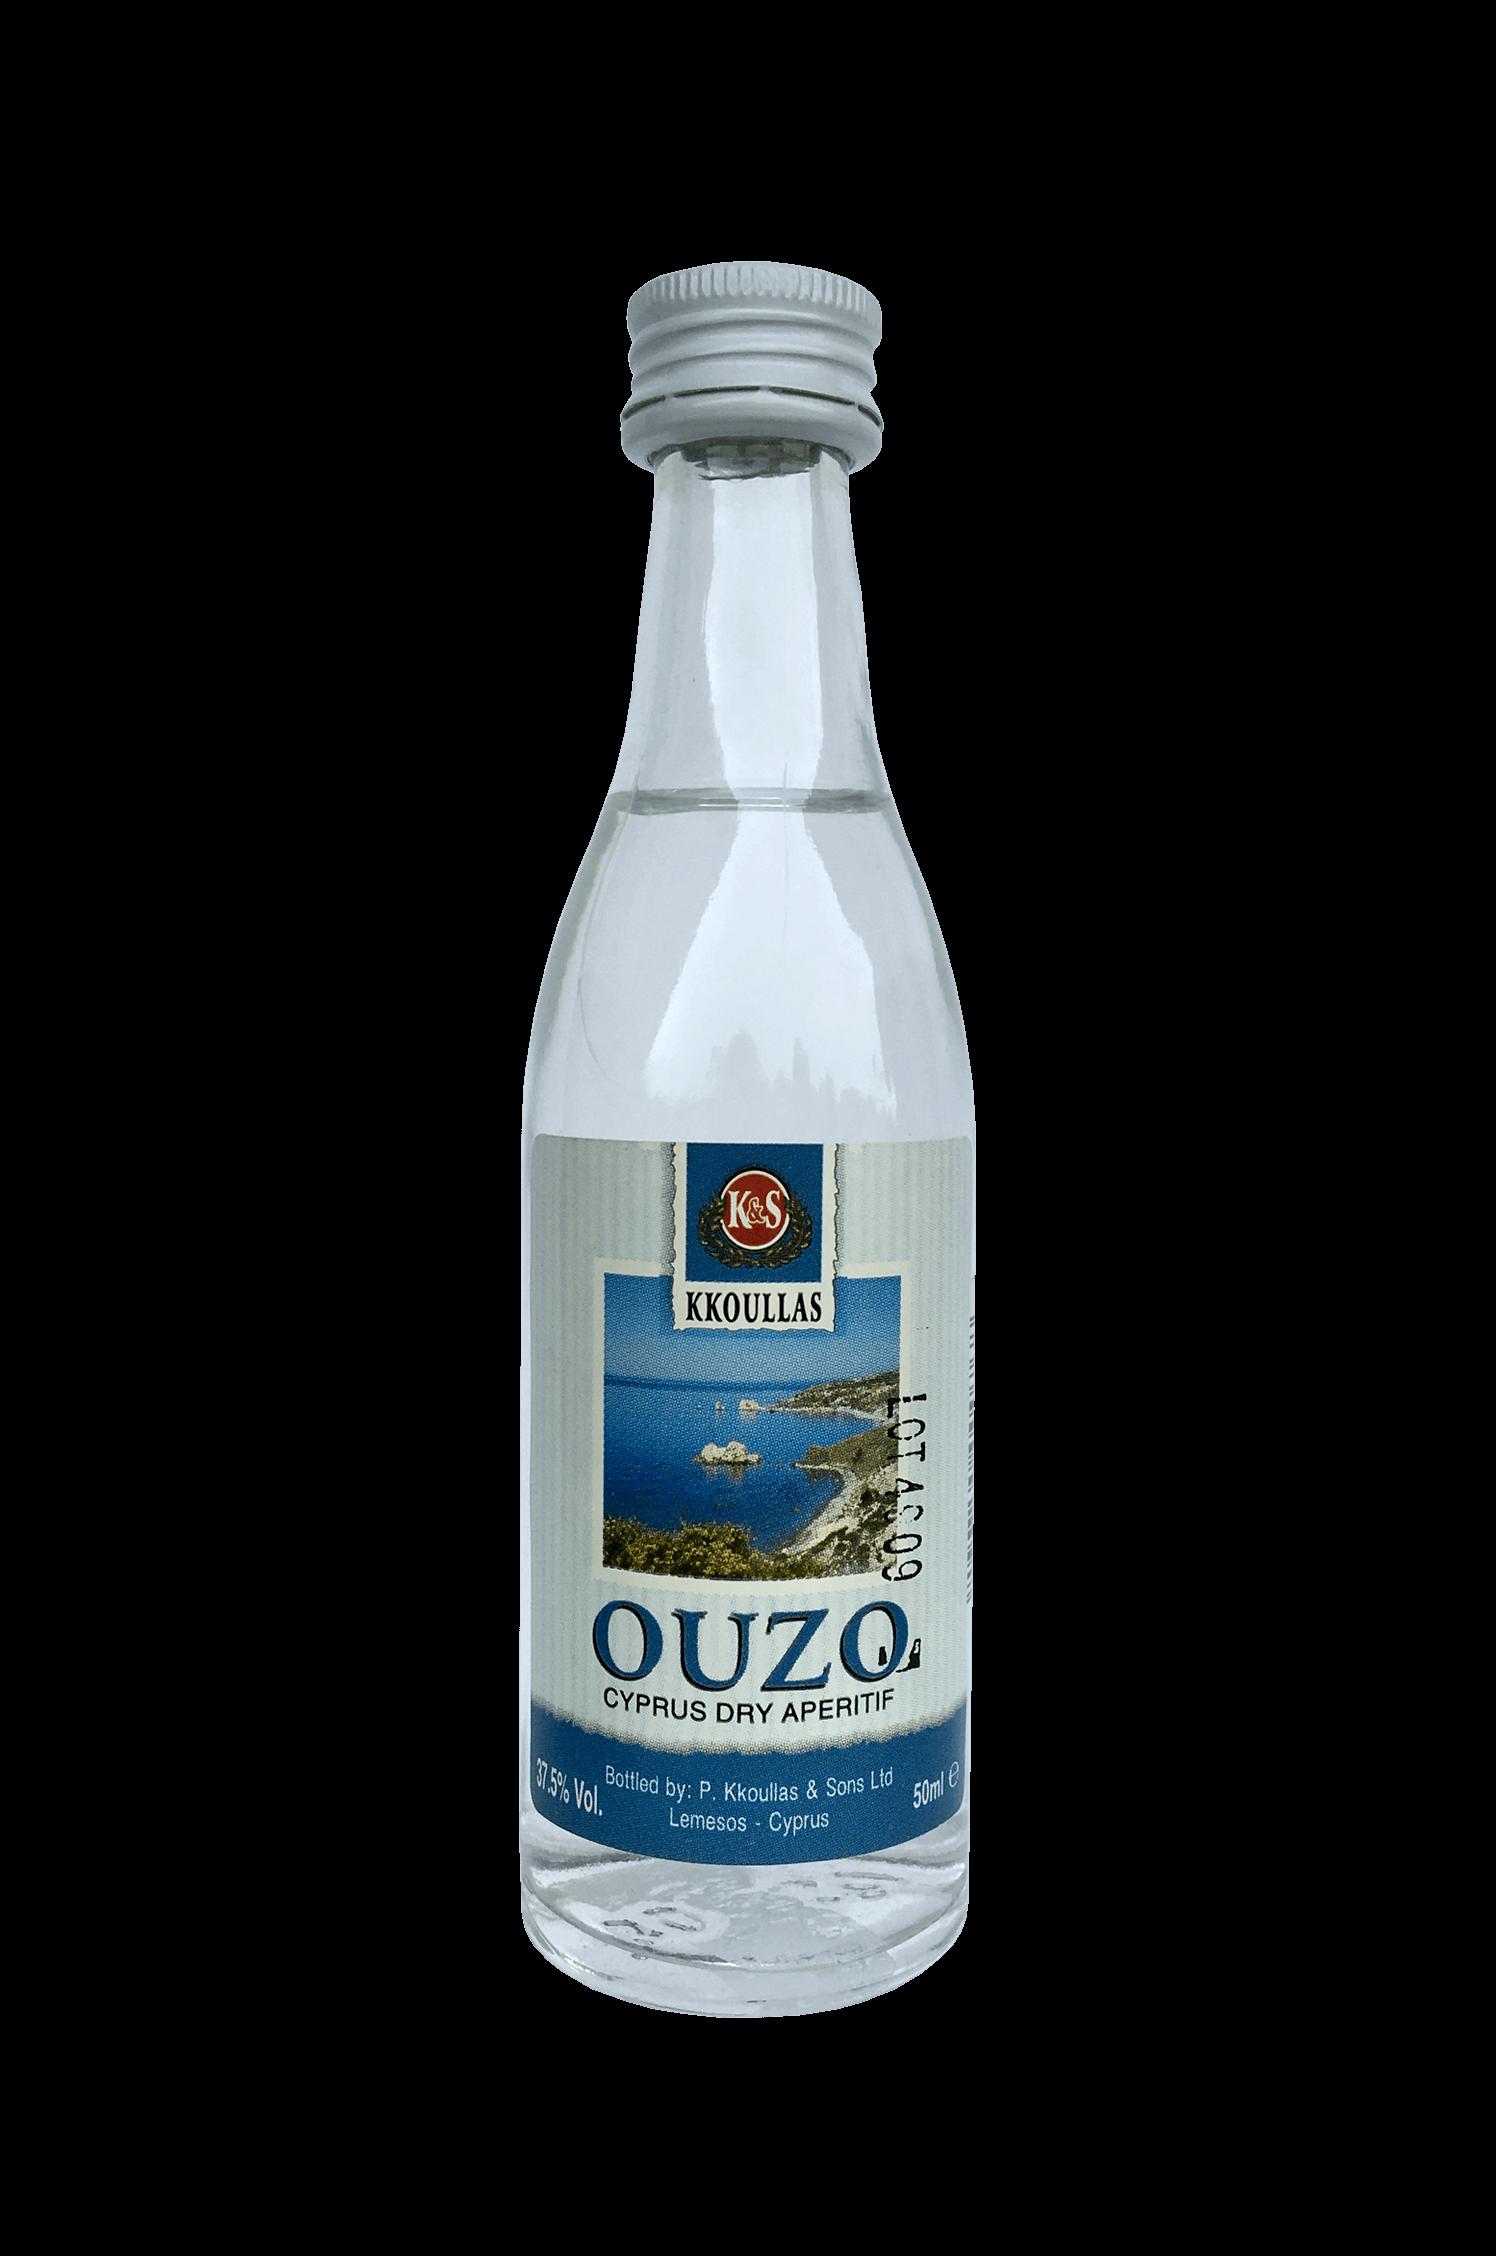 Ouzo Cyprus Dry Aperitif